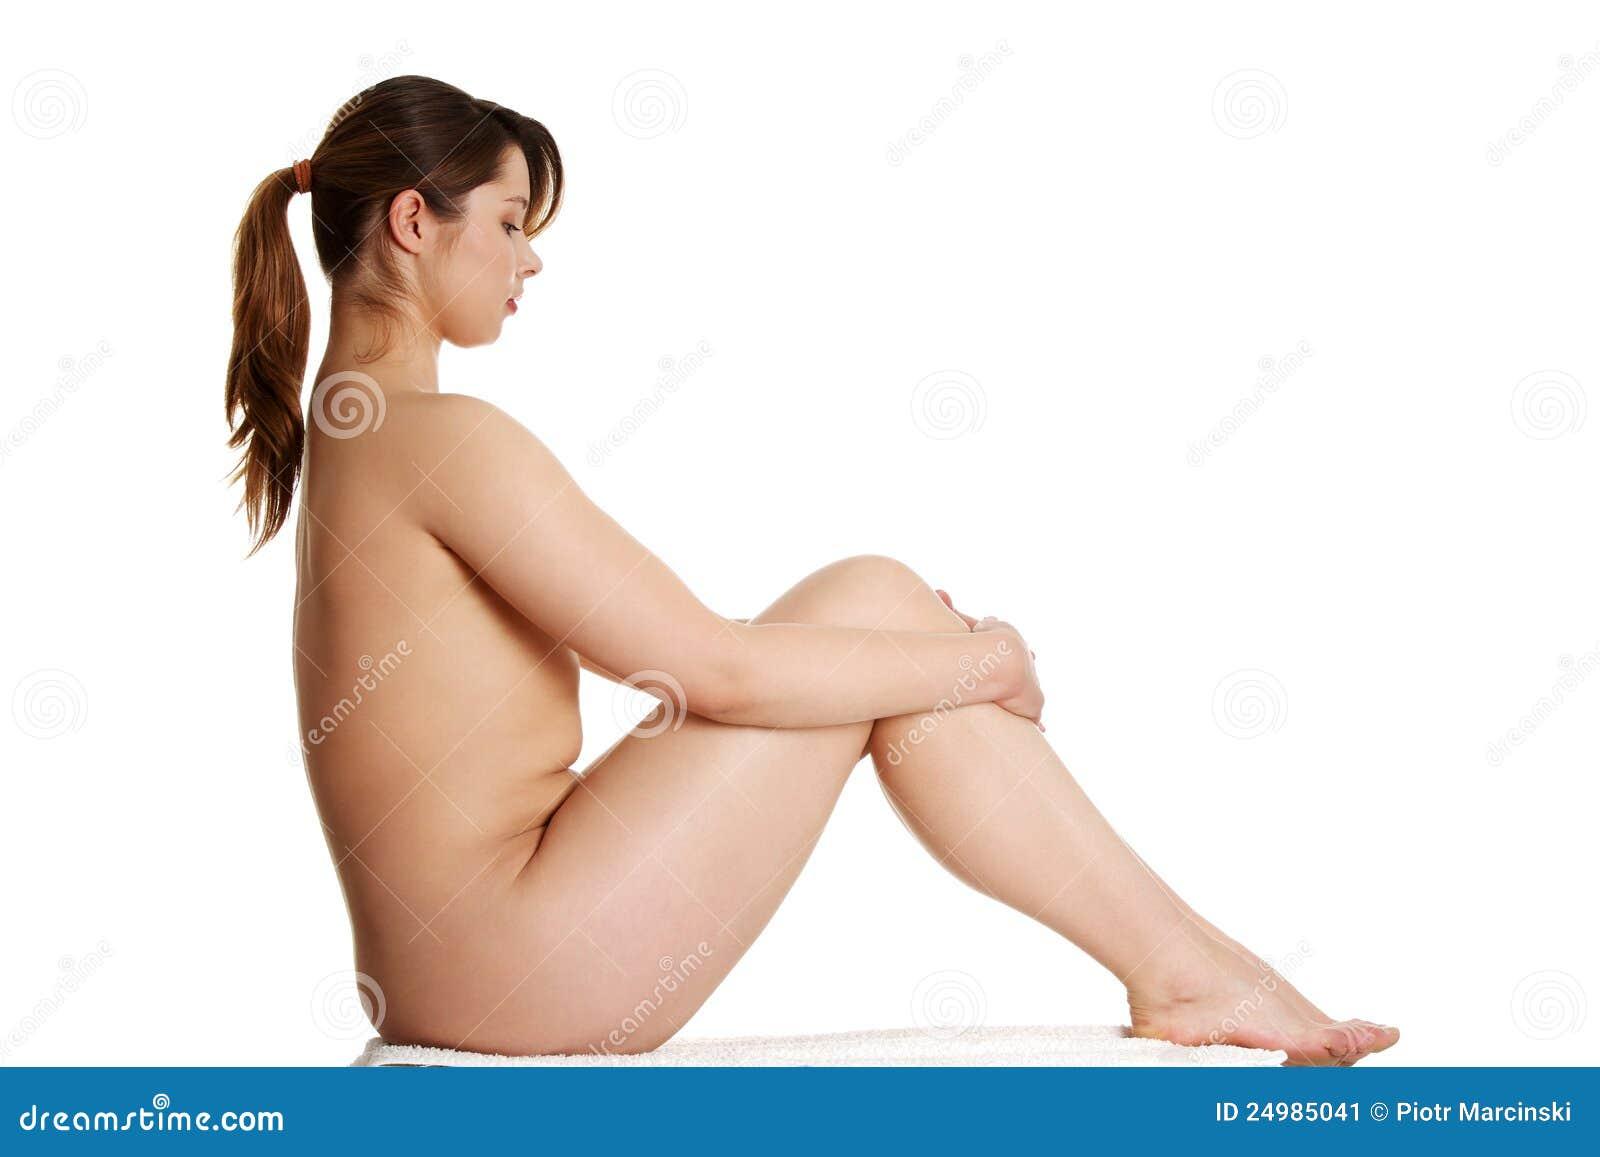 Mujeres gordas desnudas follando - Vdeos porno Pornes